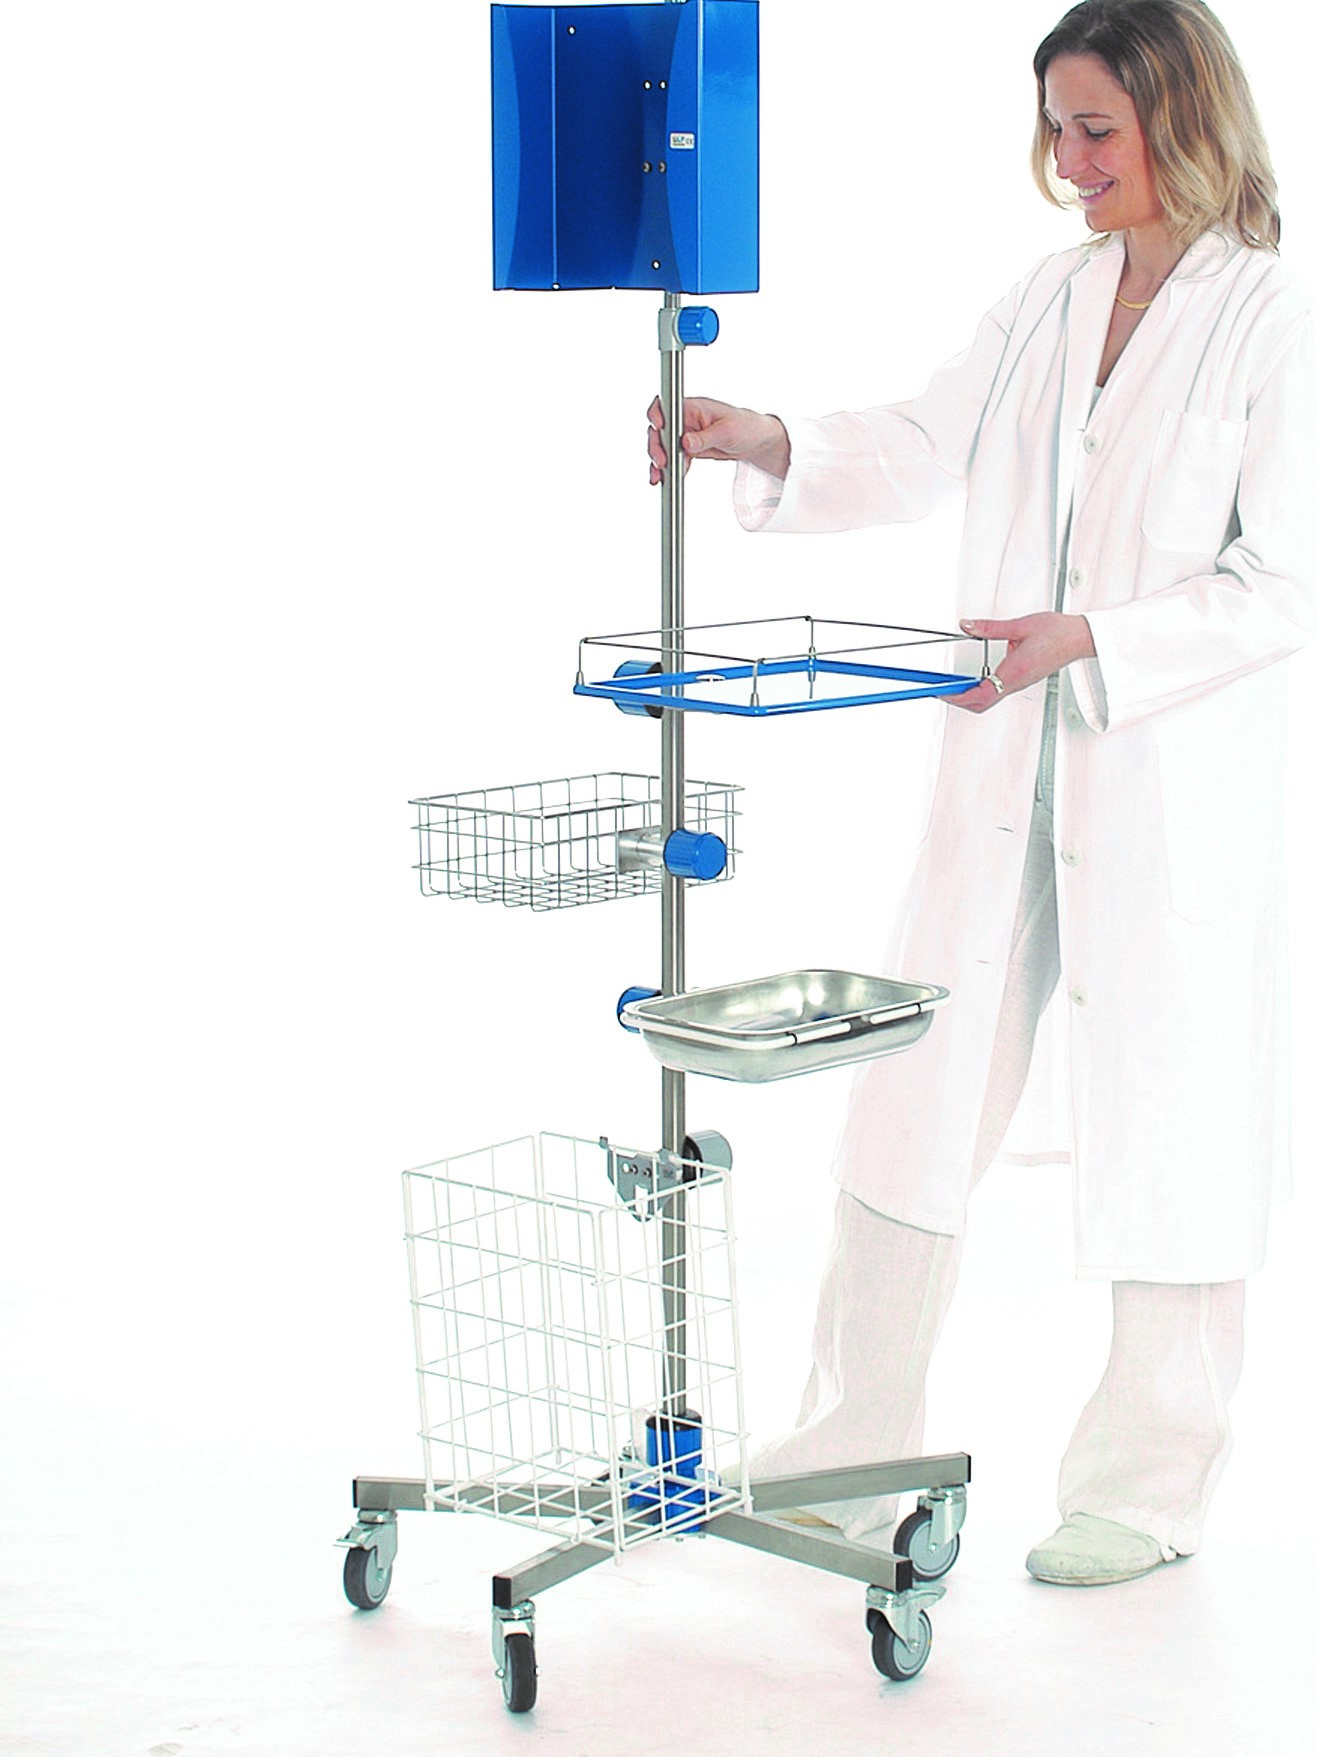 tragesystem-auct-infusionsständer